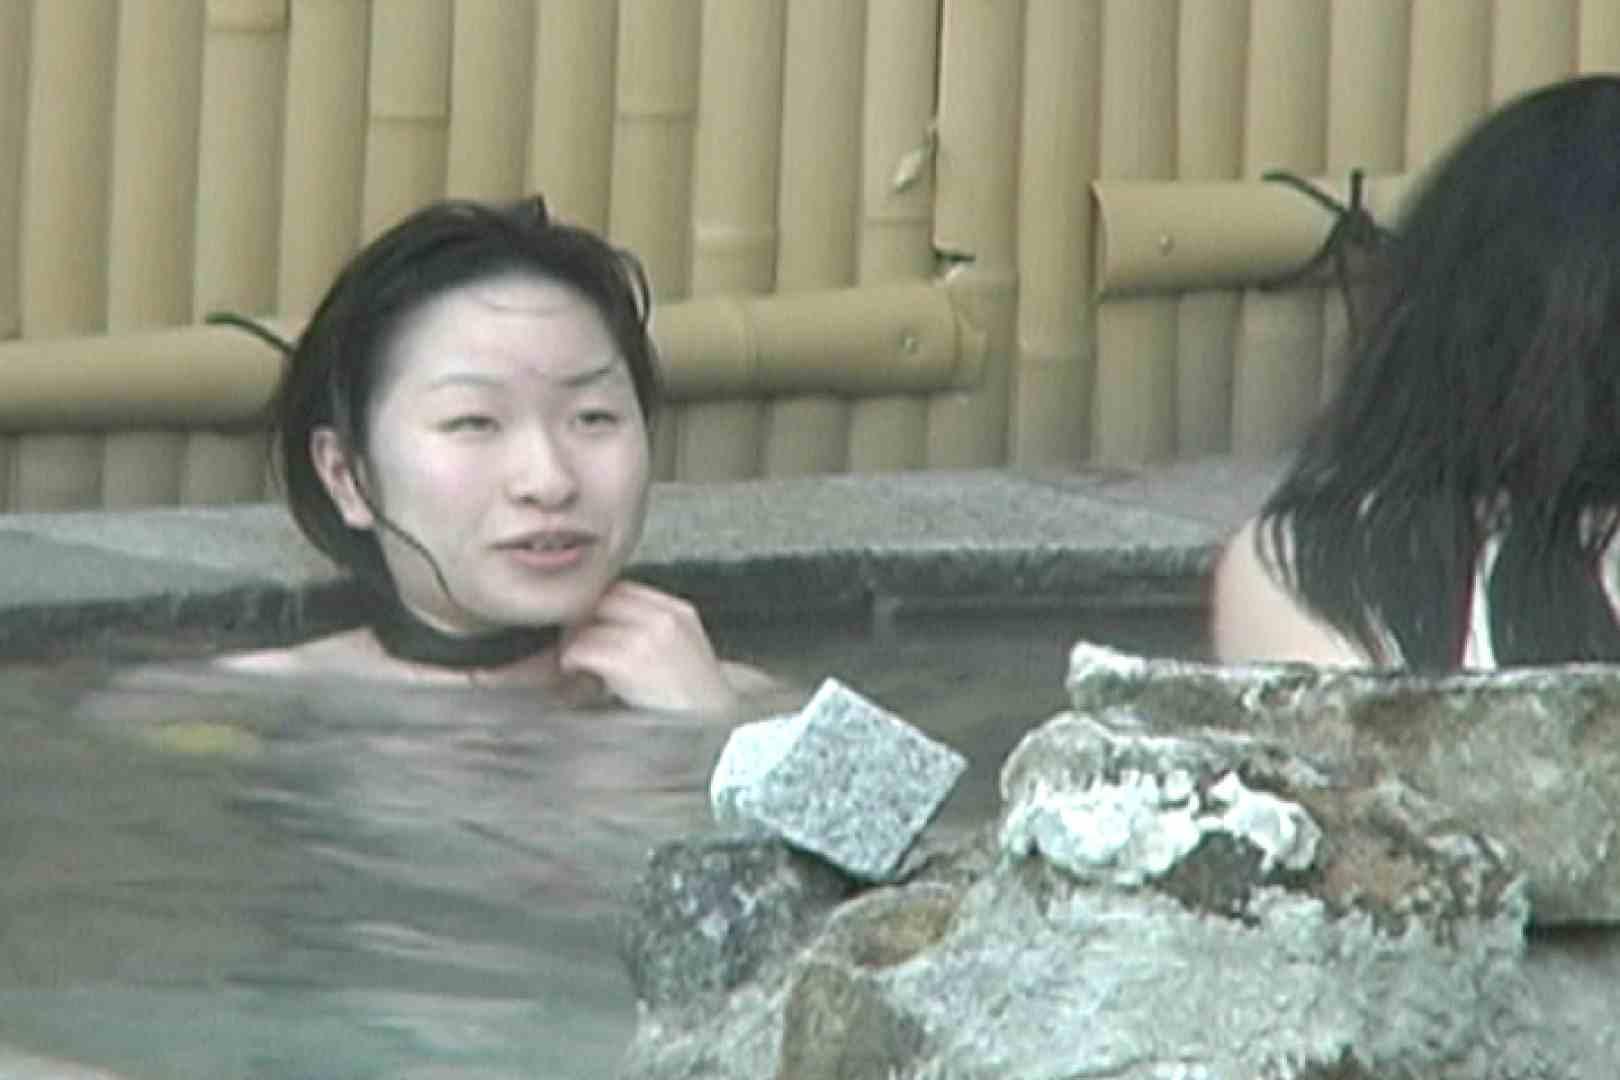 Aquaな露天風呂Vol.595 0  89連発 78